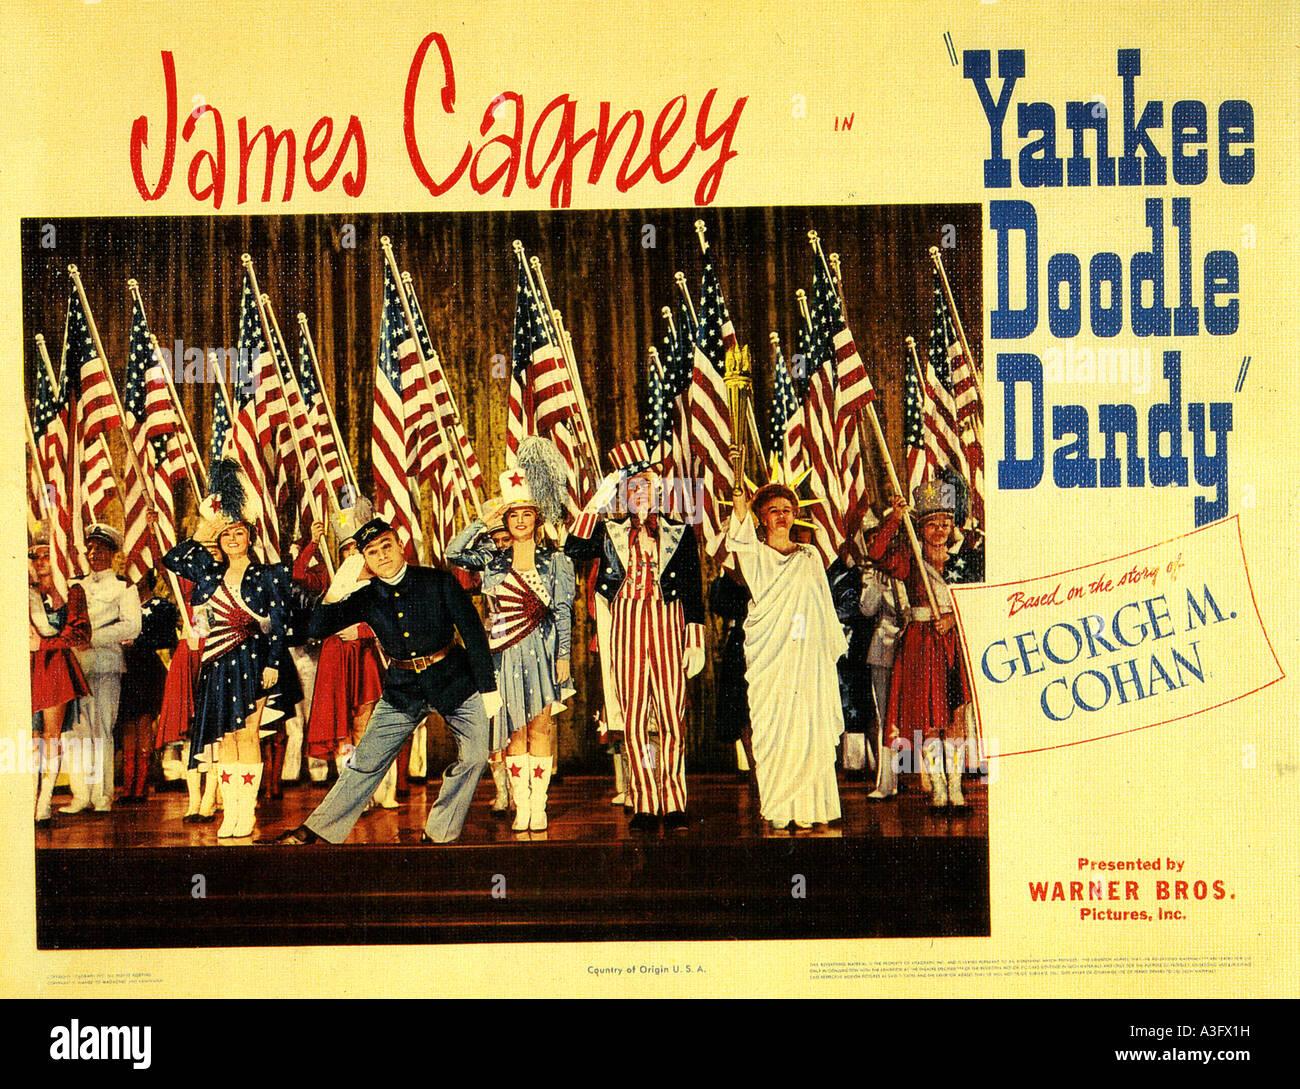 YANKEE DOODLE DANDY 1942 Warner film biopic con James Cagney come la vita reale George M Cohan Immagini Stock